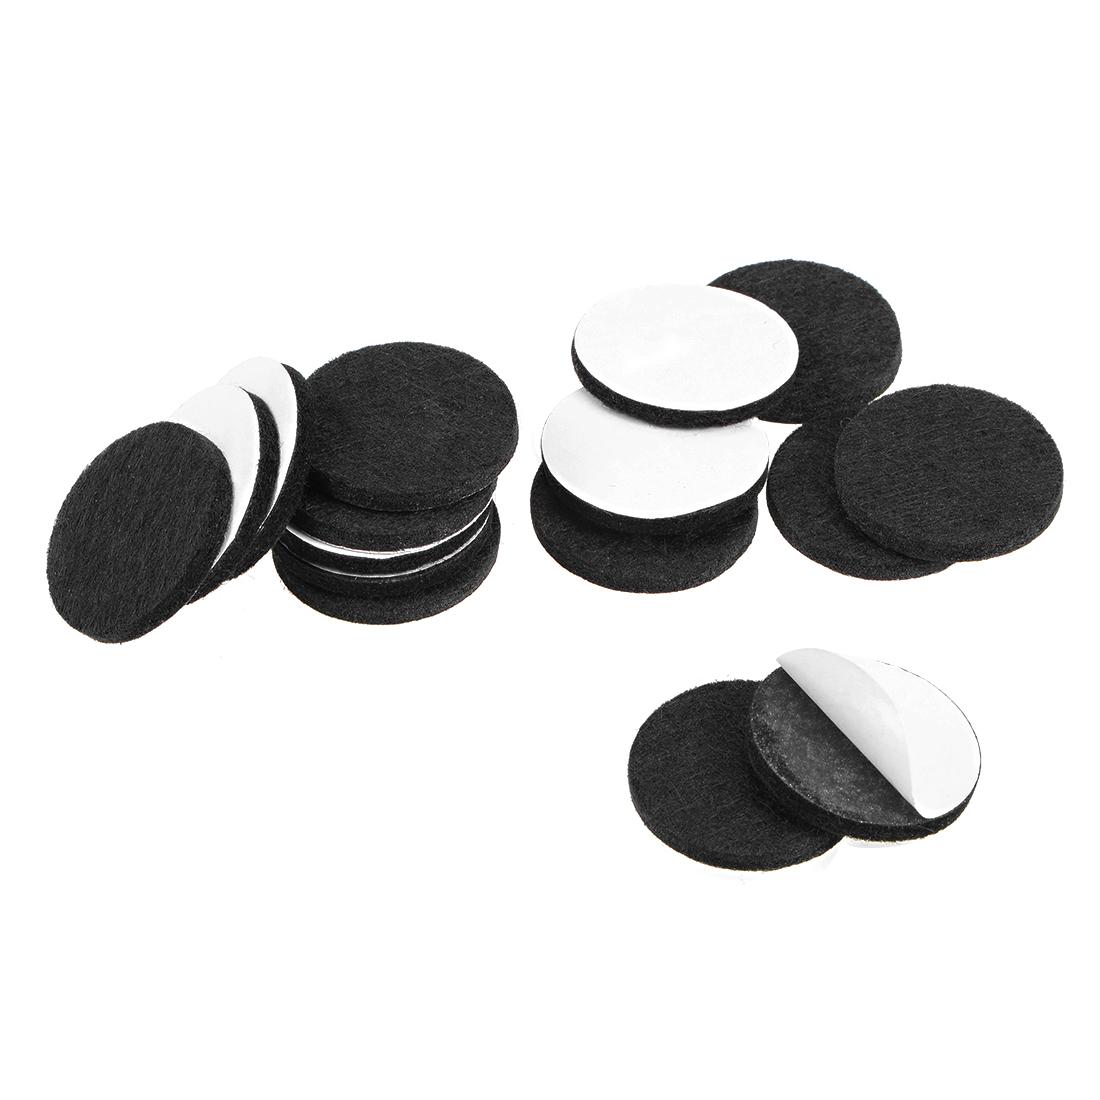 Furniture Pads Adhesive Felt Pads 30mm Diameter 3mm Thick Round Black 28Pcs